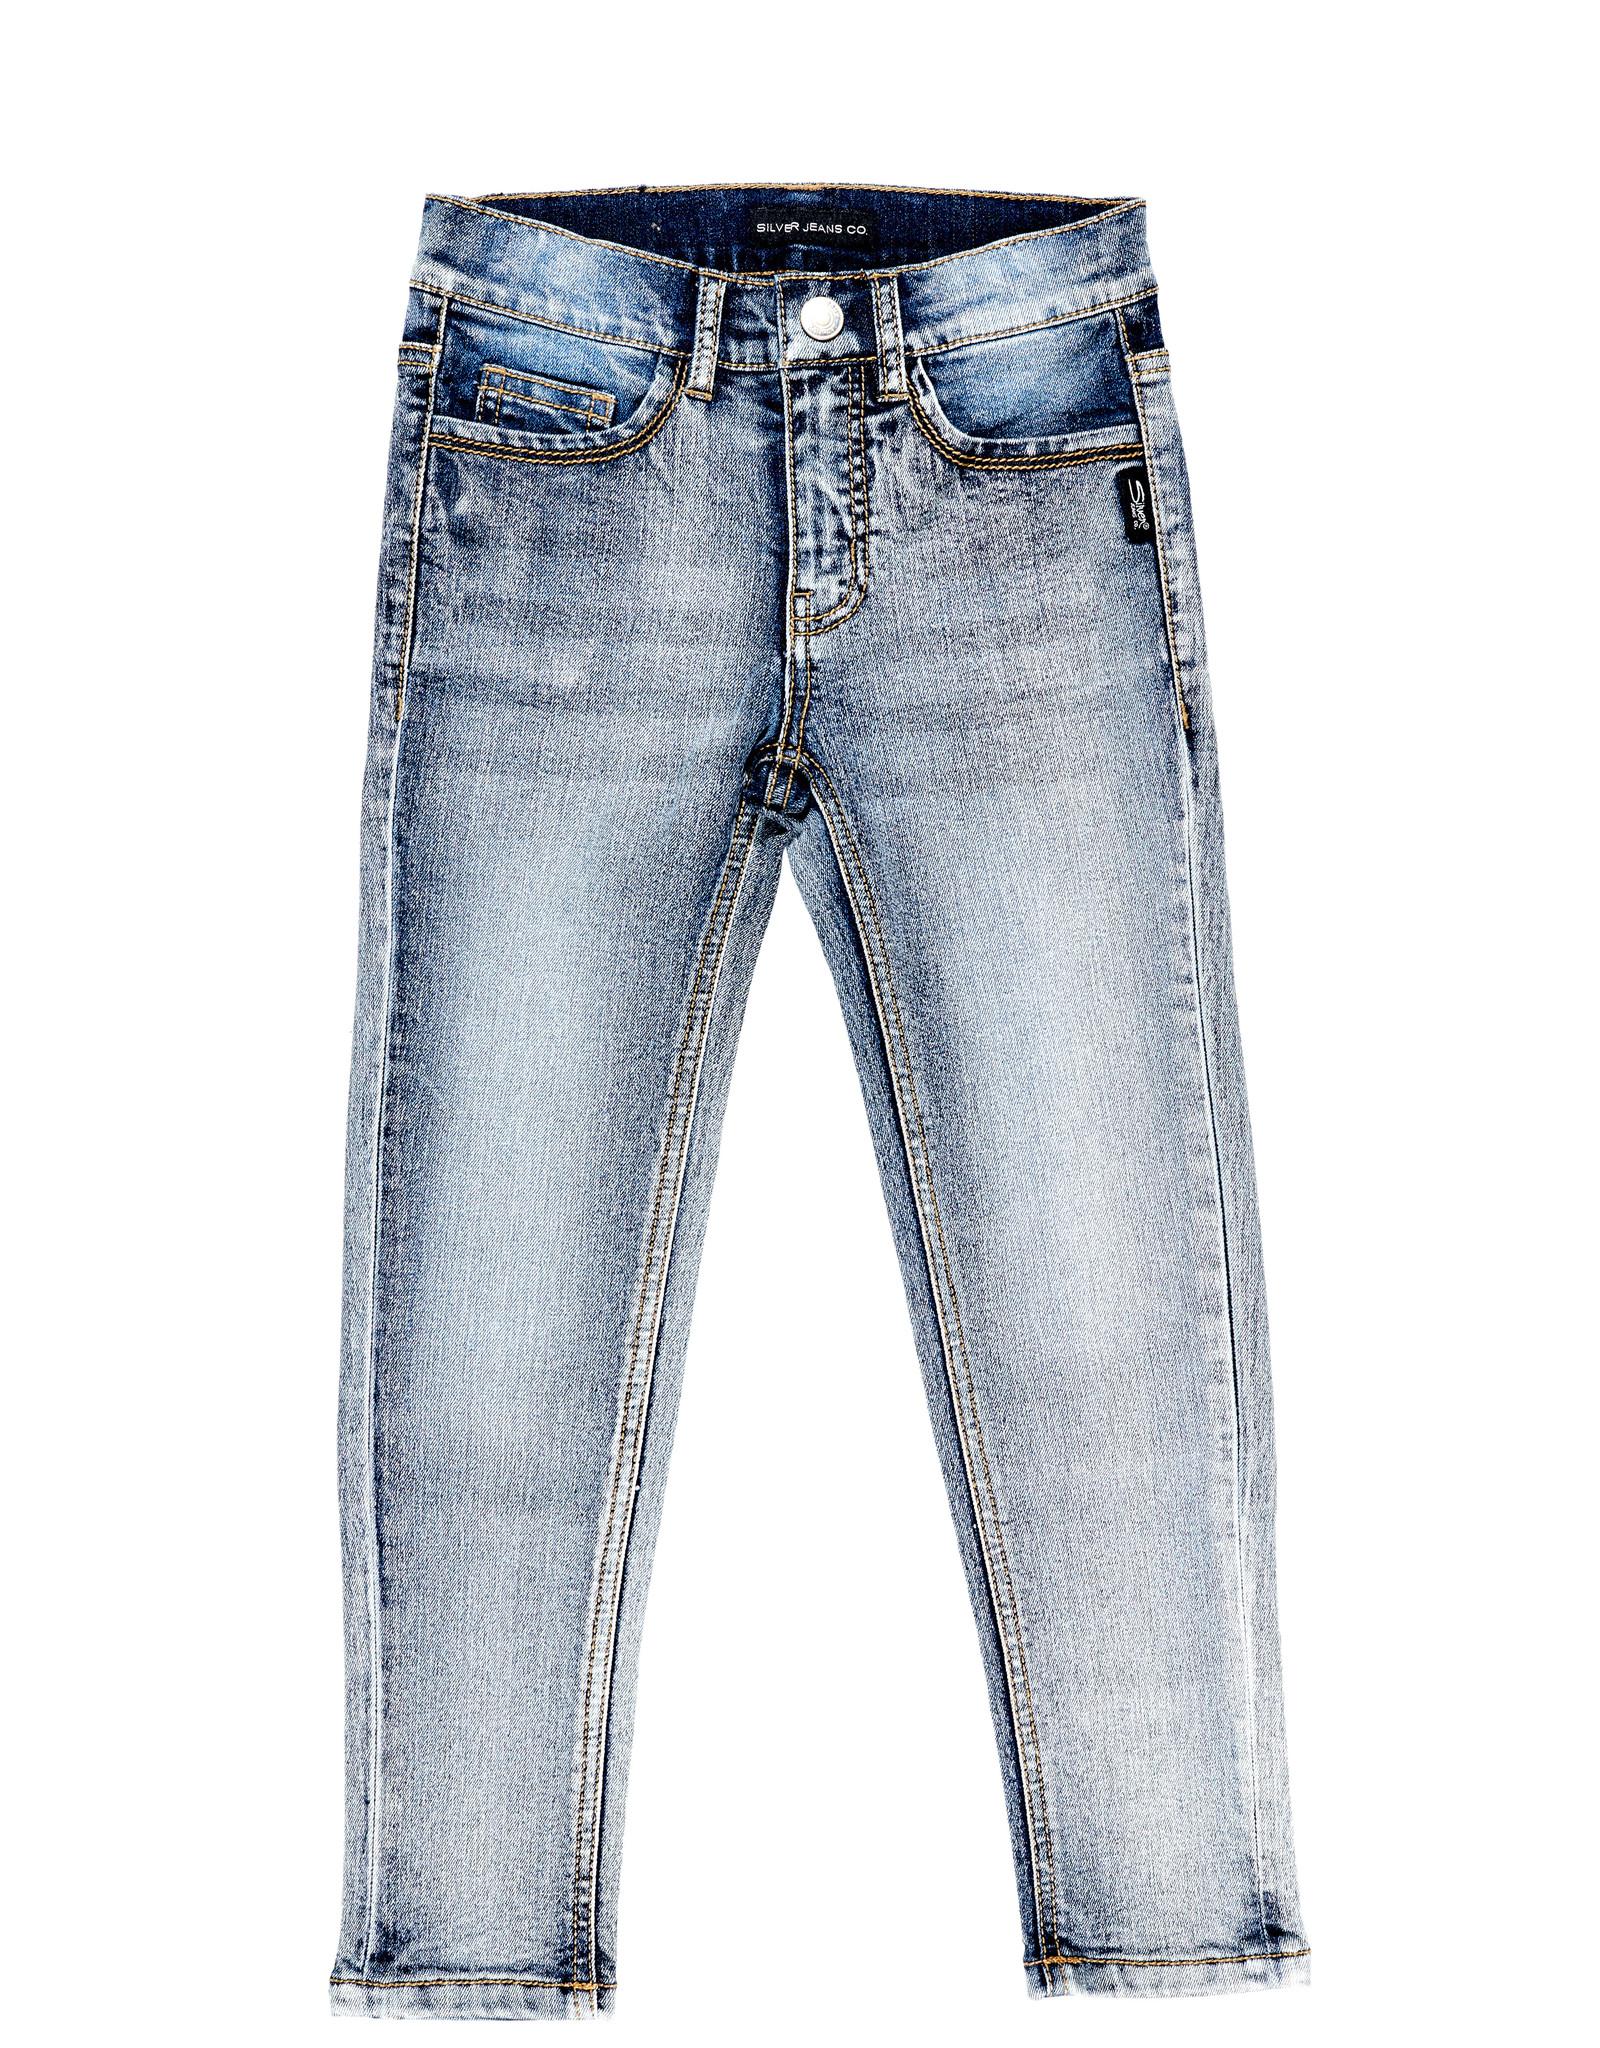 Silver Jeans Silver Jeans Girls Jeggings Fit Denim